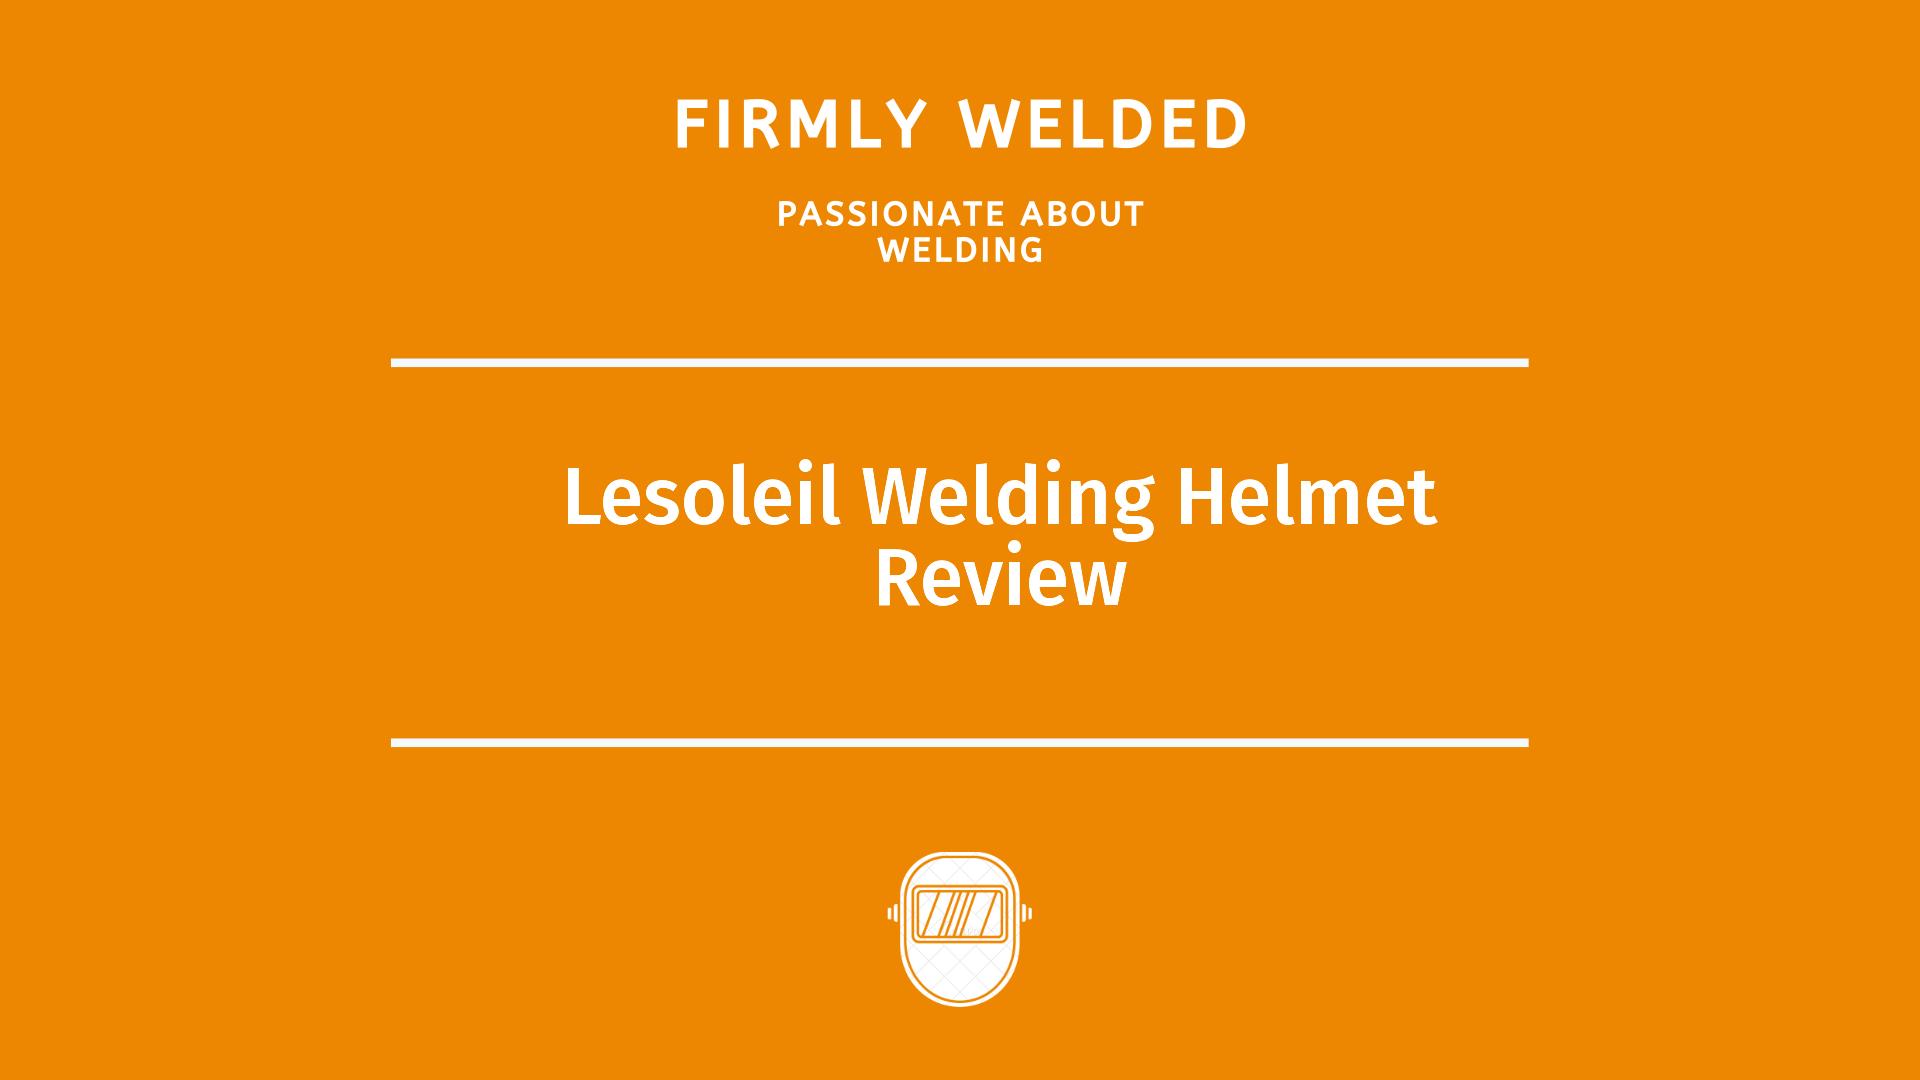 Lesoleil Welding Helmet Review